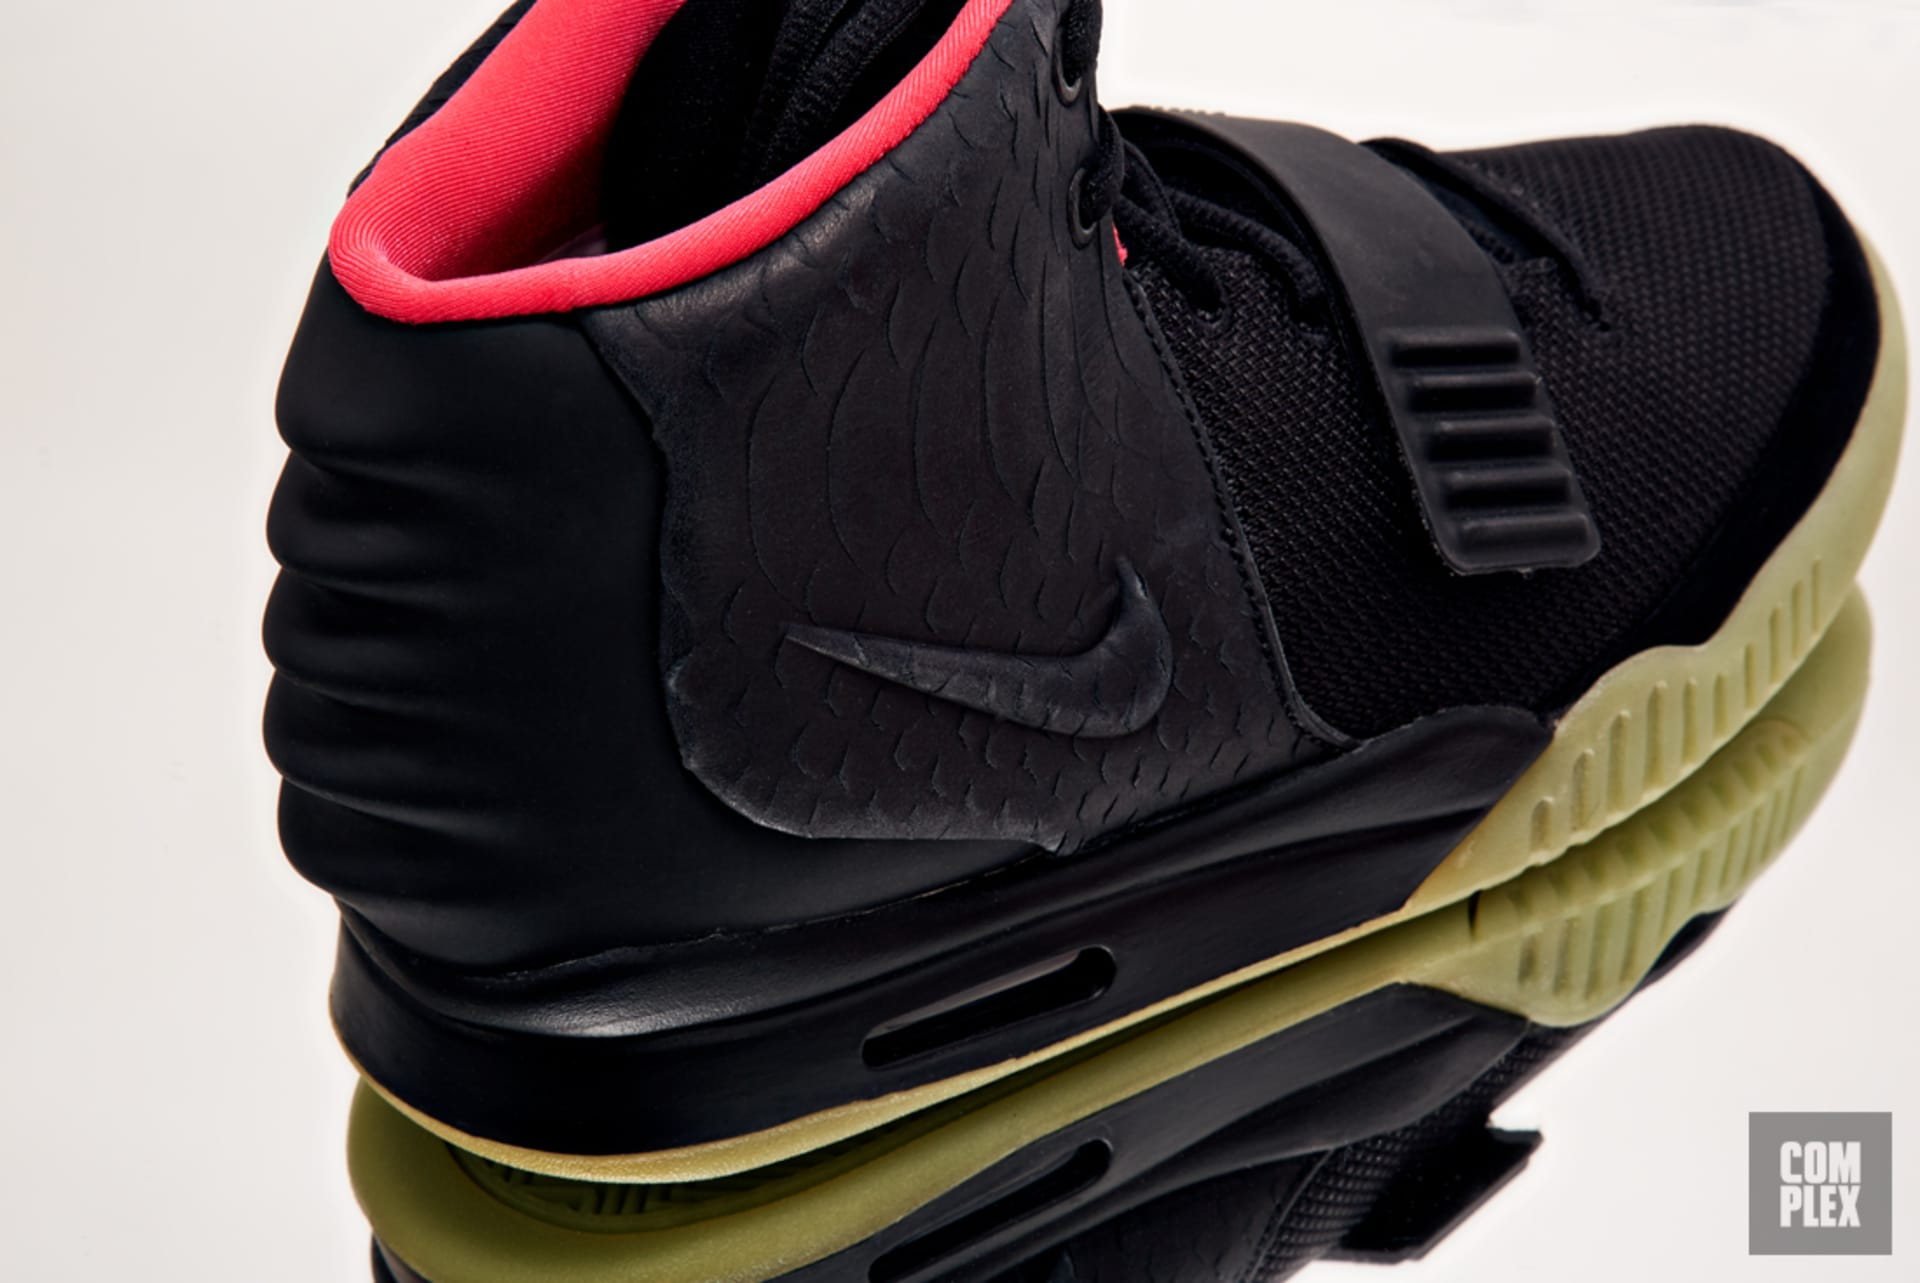 Best Price Nike Roshe Run Yeezy 2 Limited Edition Mens Dark